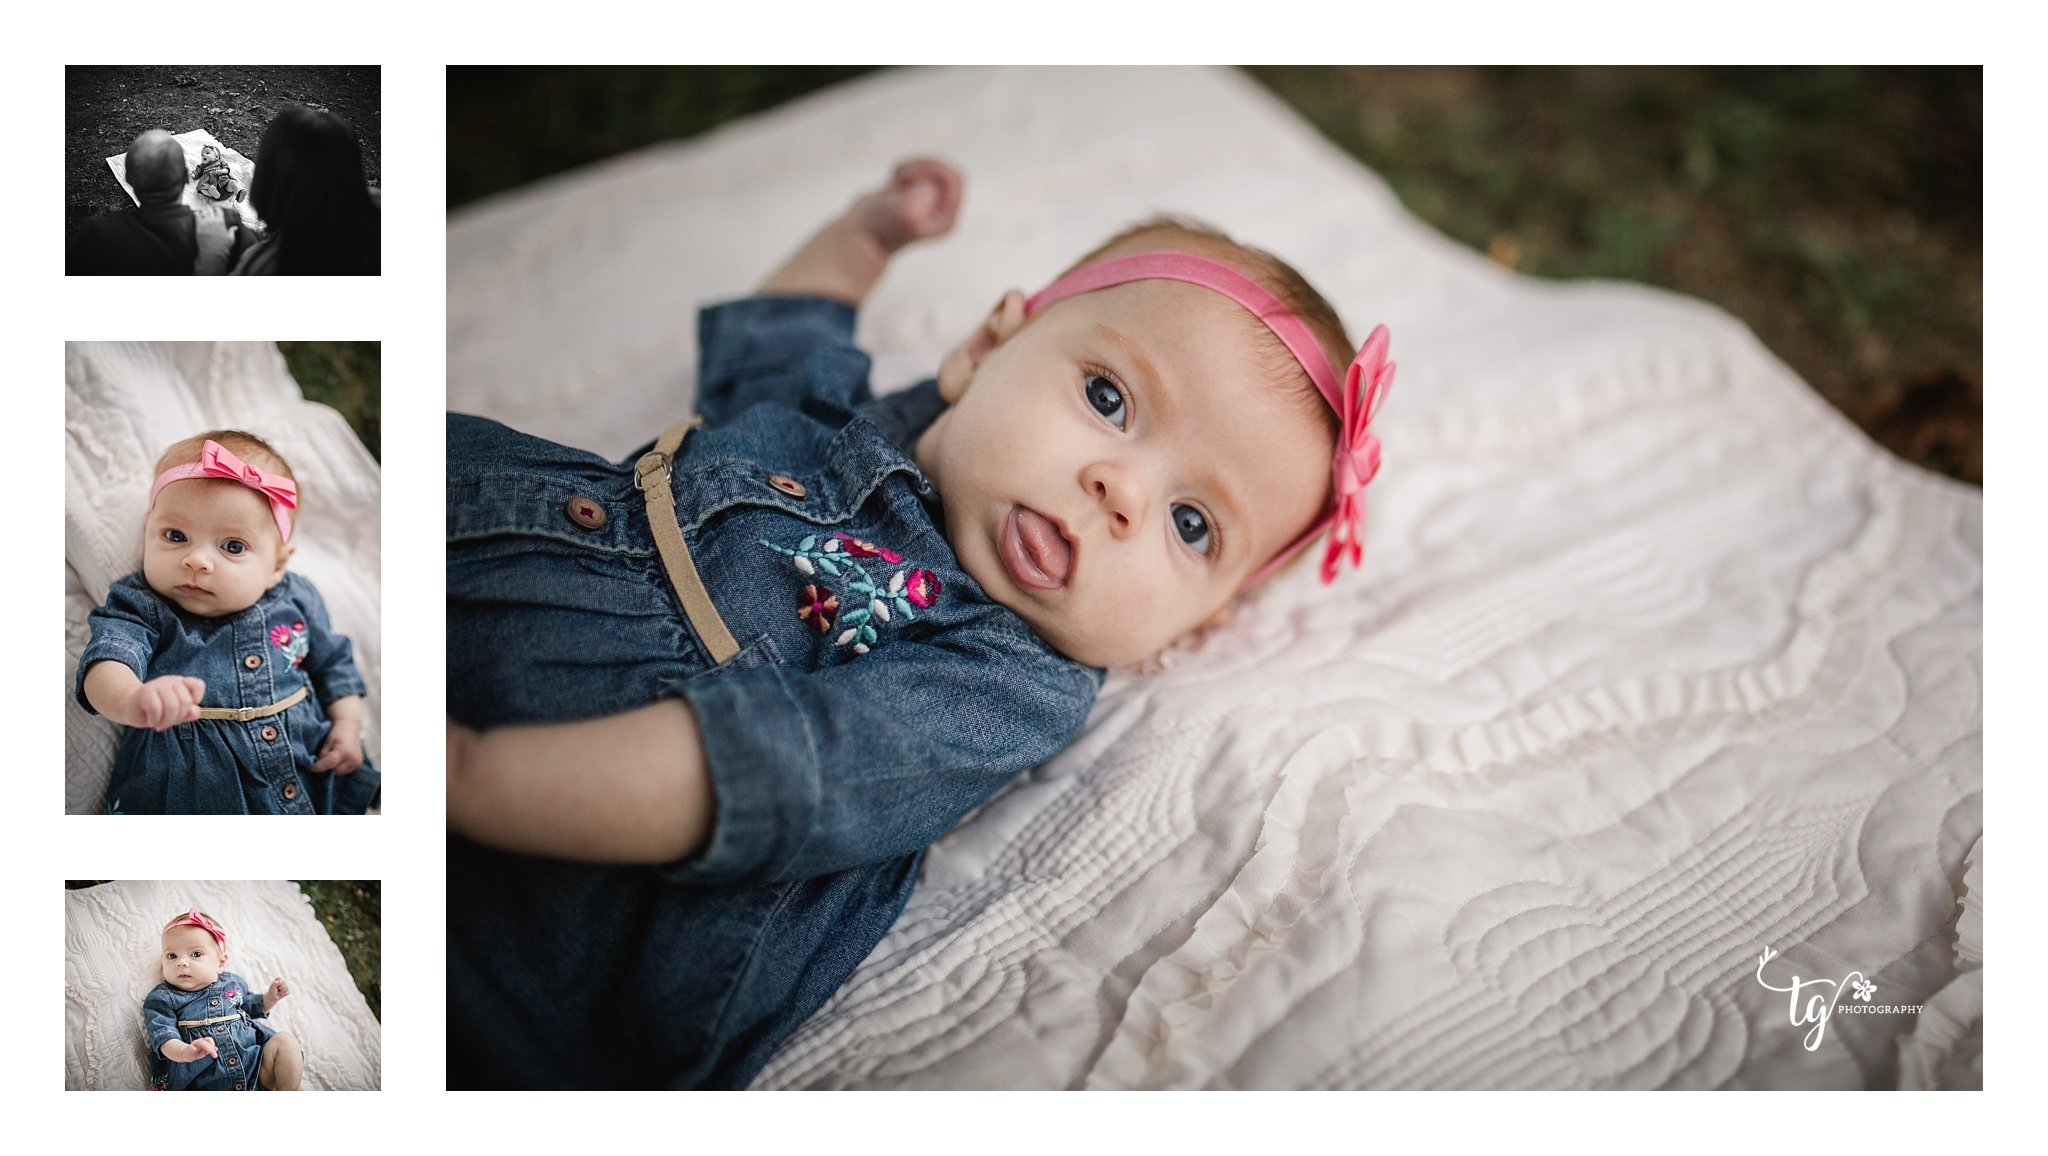 baby on anthrhopologie quilt wearing denim dress and headband